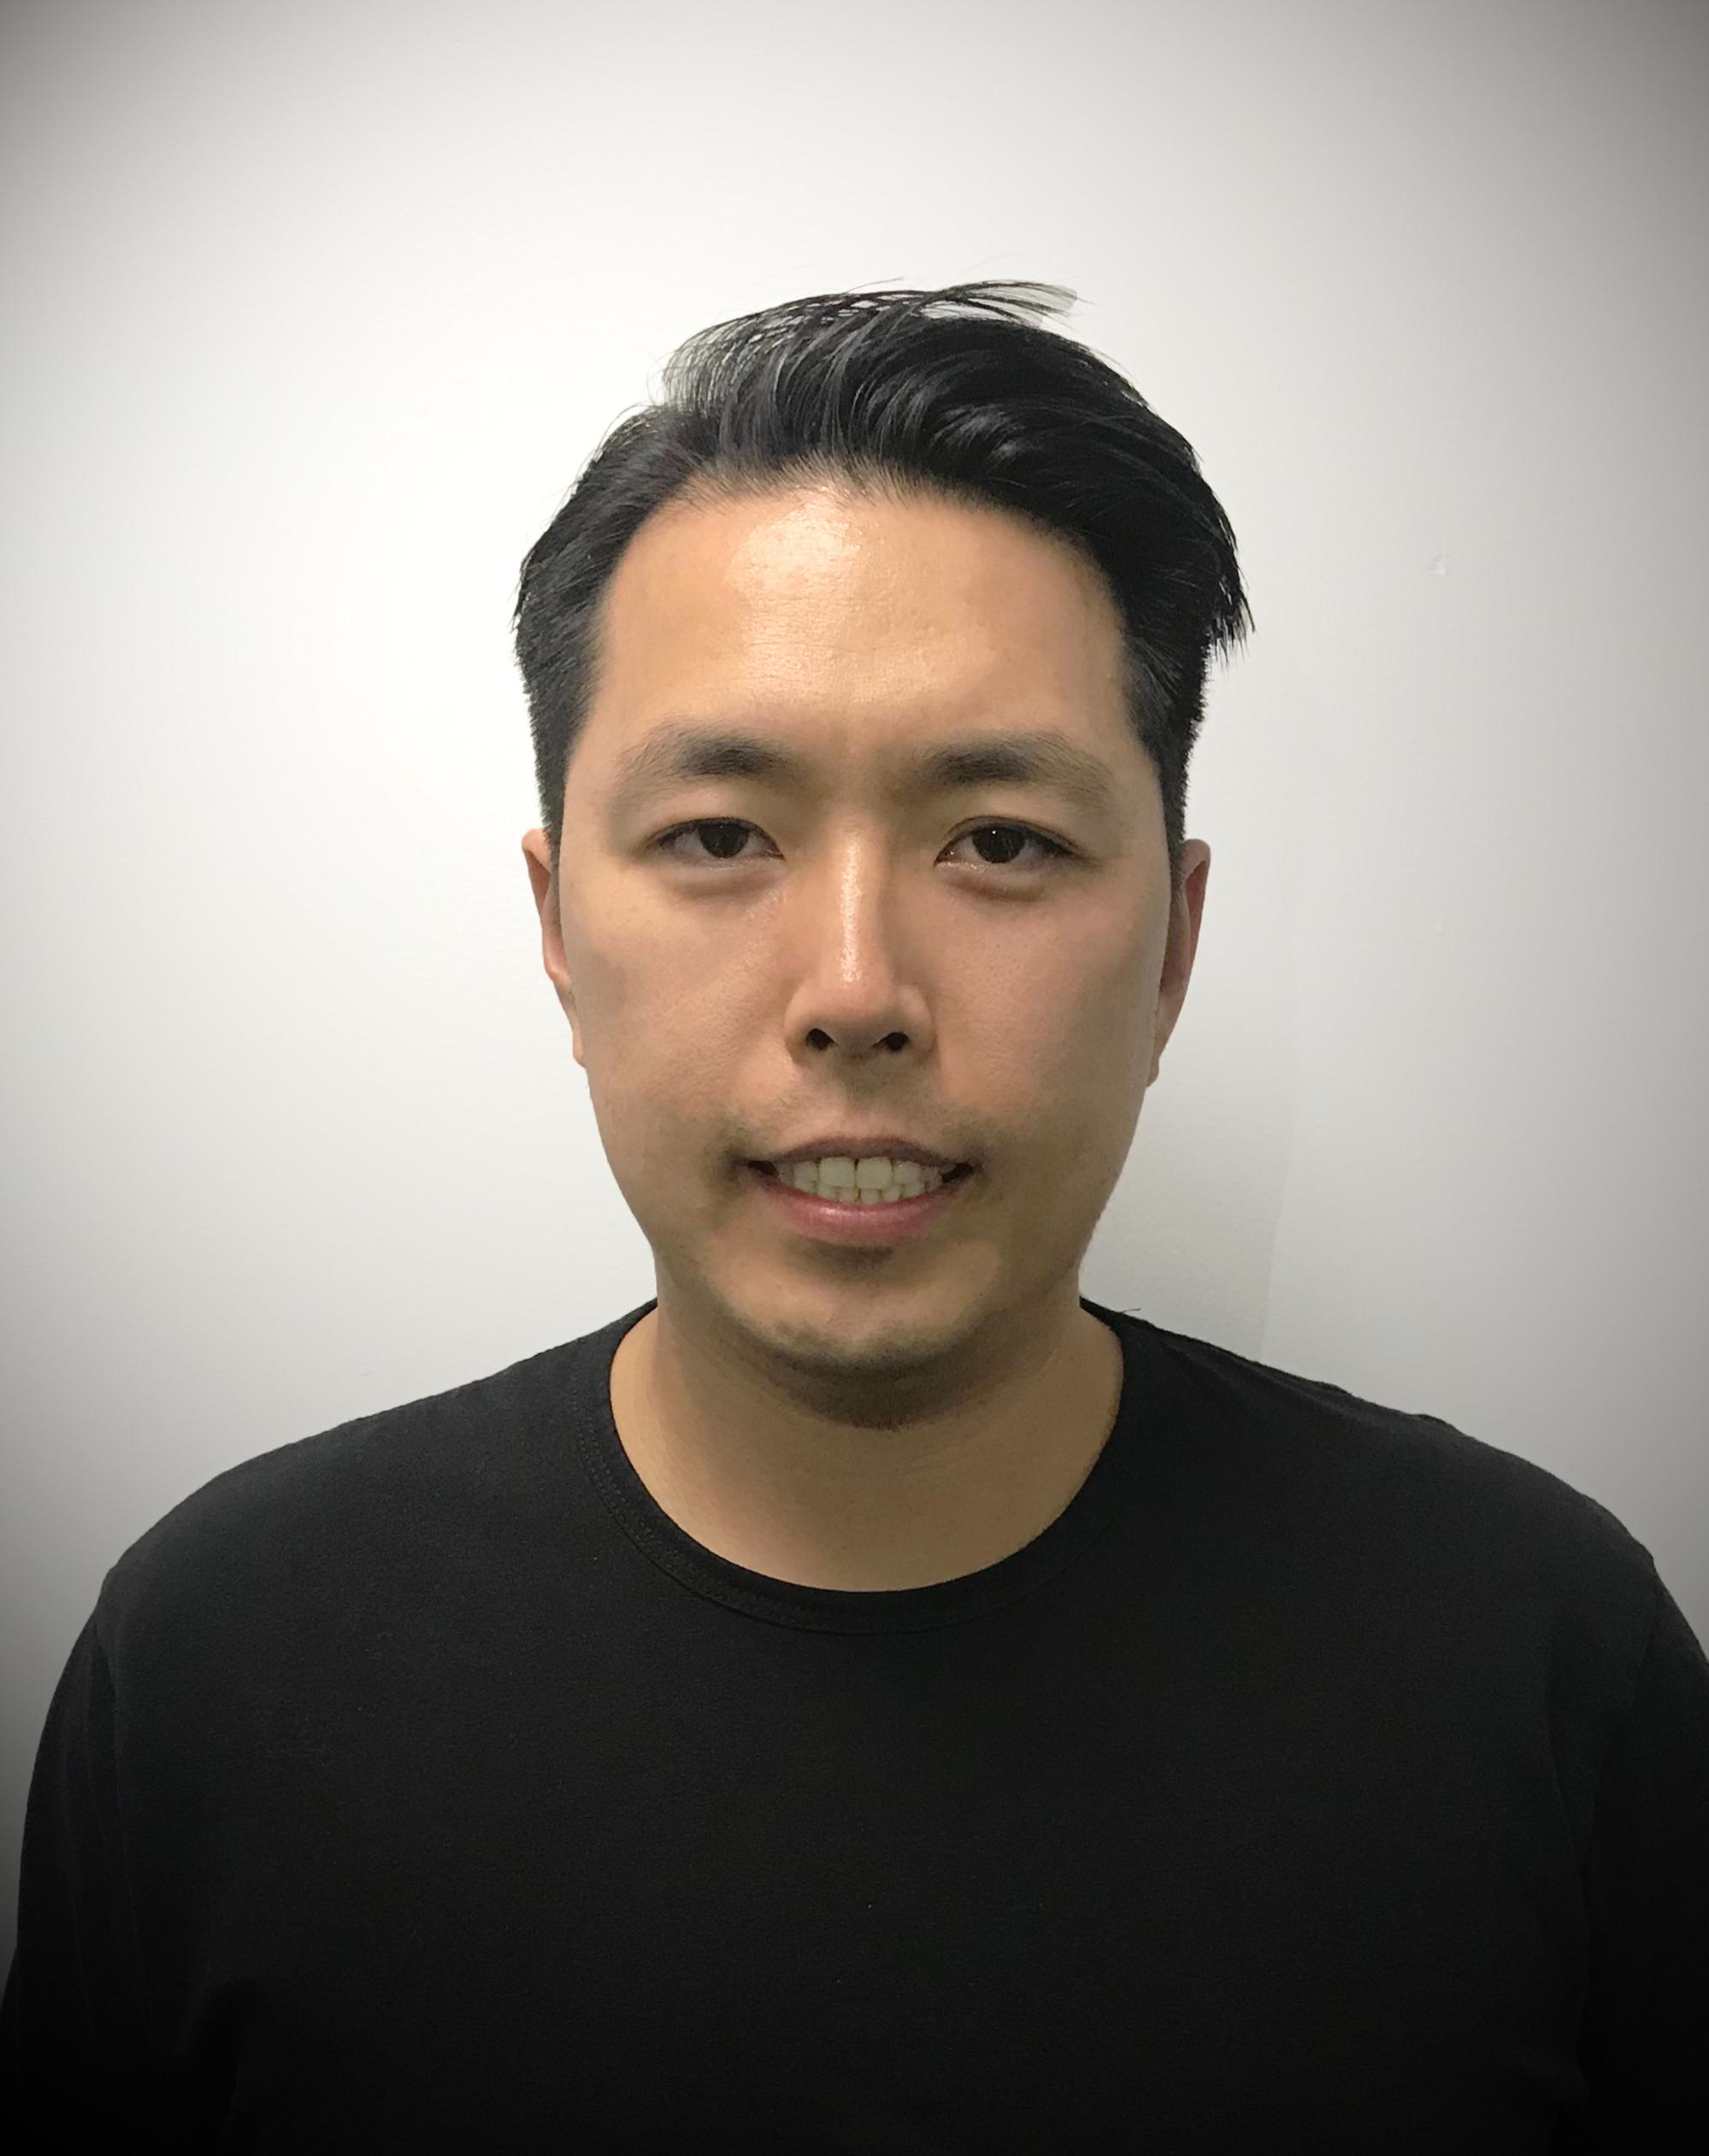 Soonhwan Choi | Lead Pastor, New Church